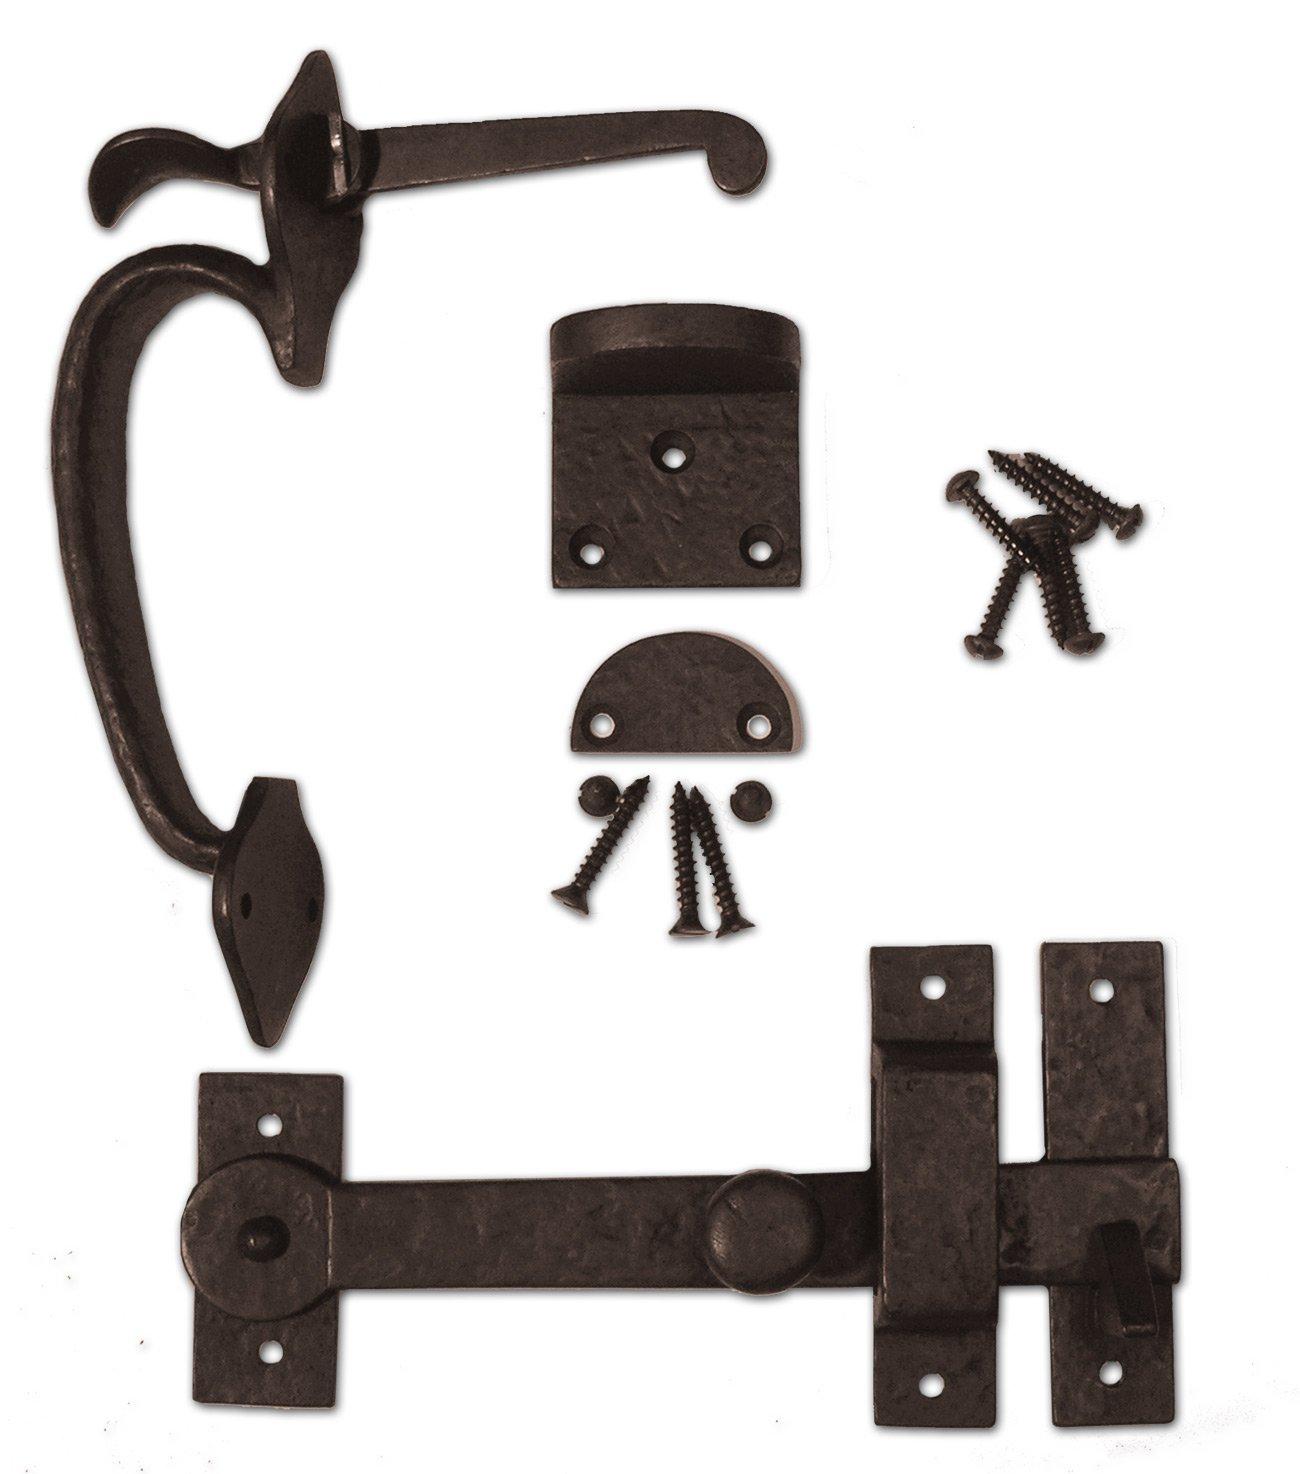 Coastal Bronze - Gate Kit - Thumb Latch Drop Bar Set - 40-900